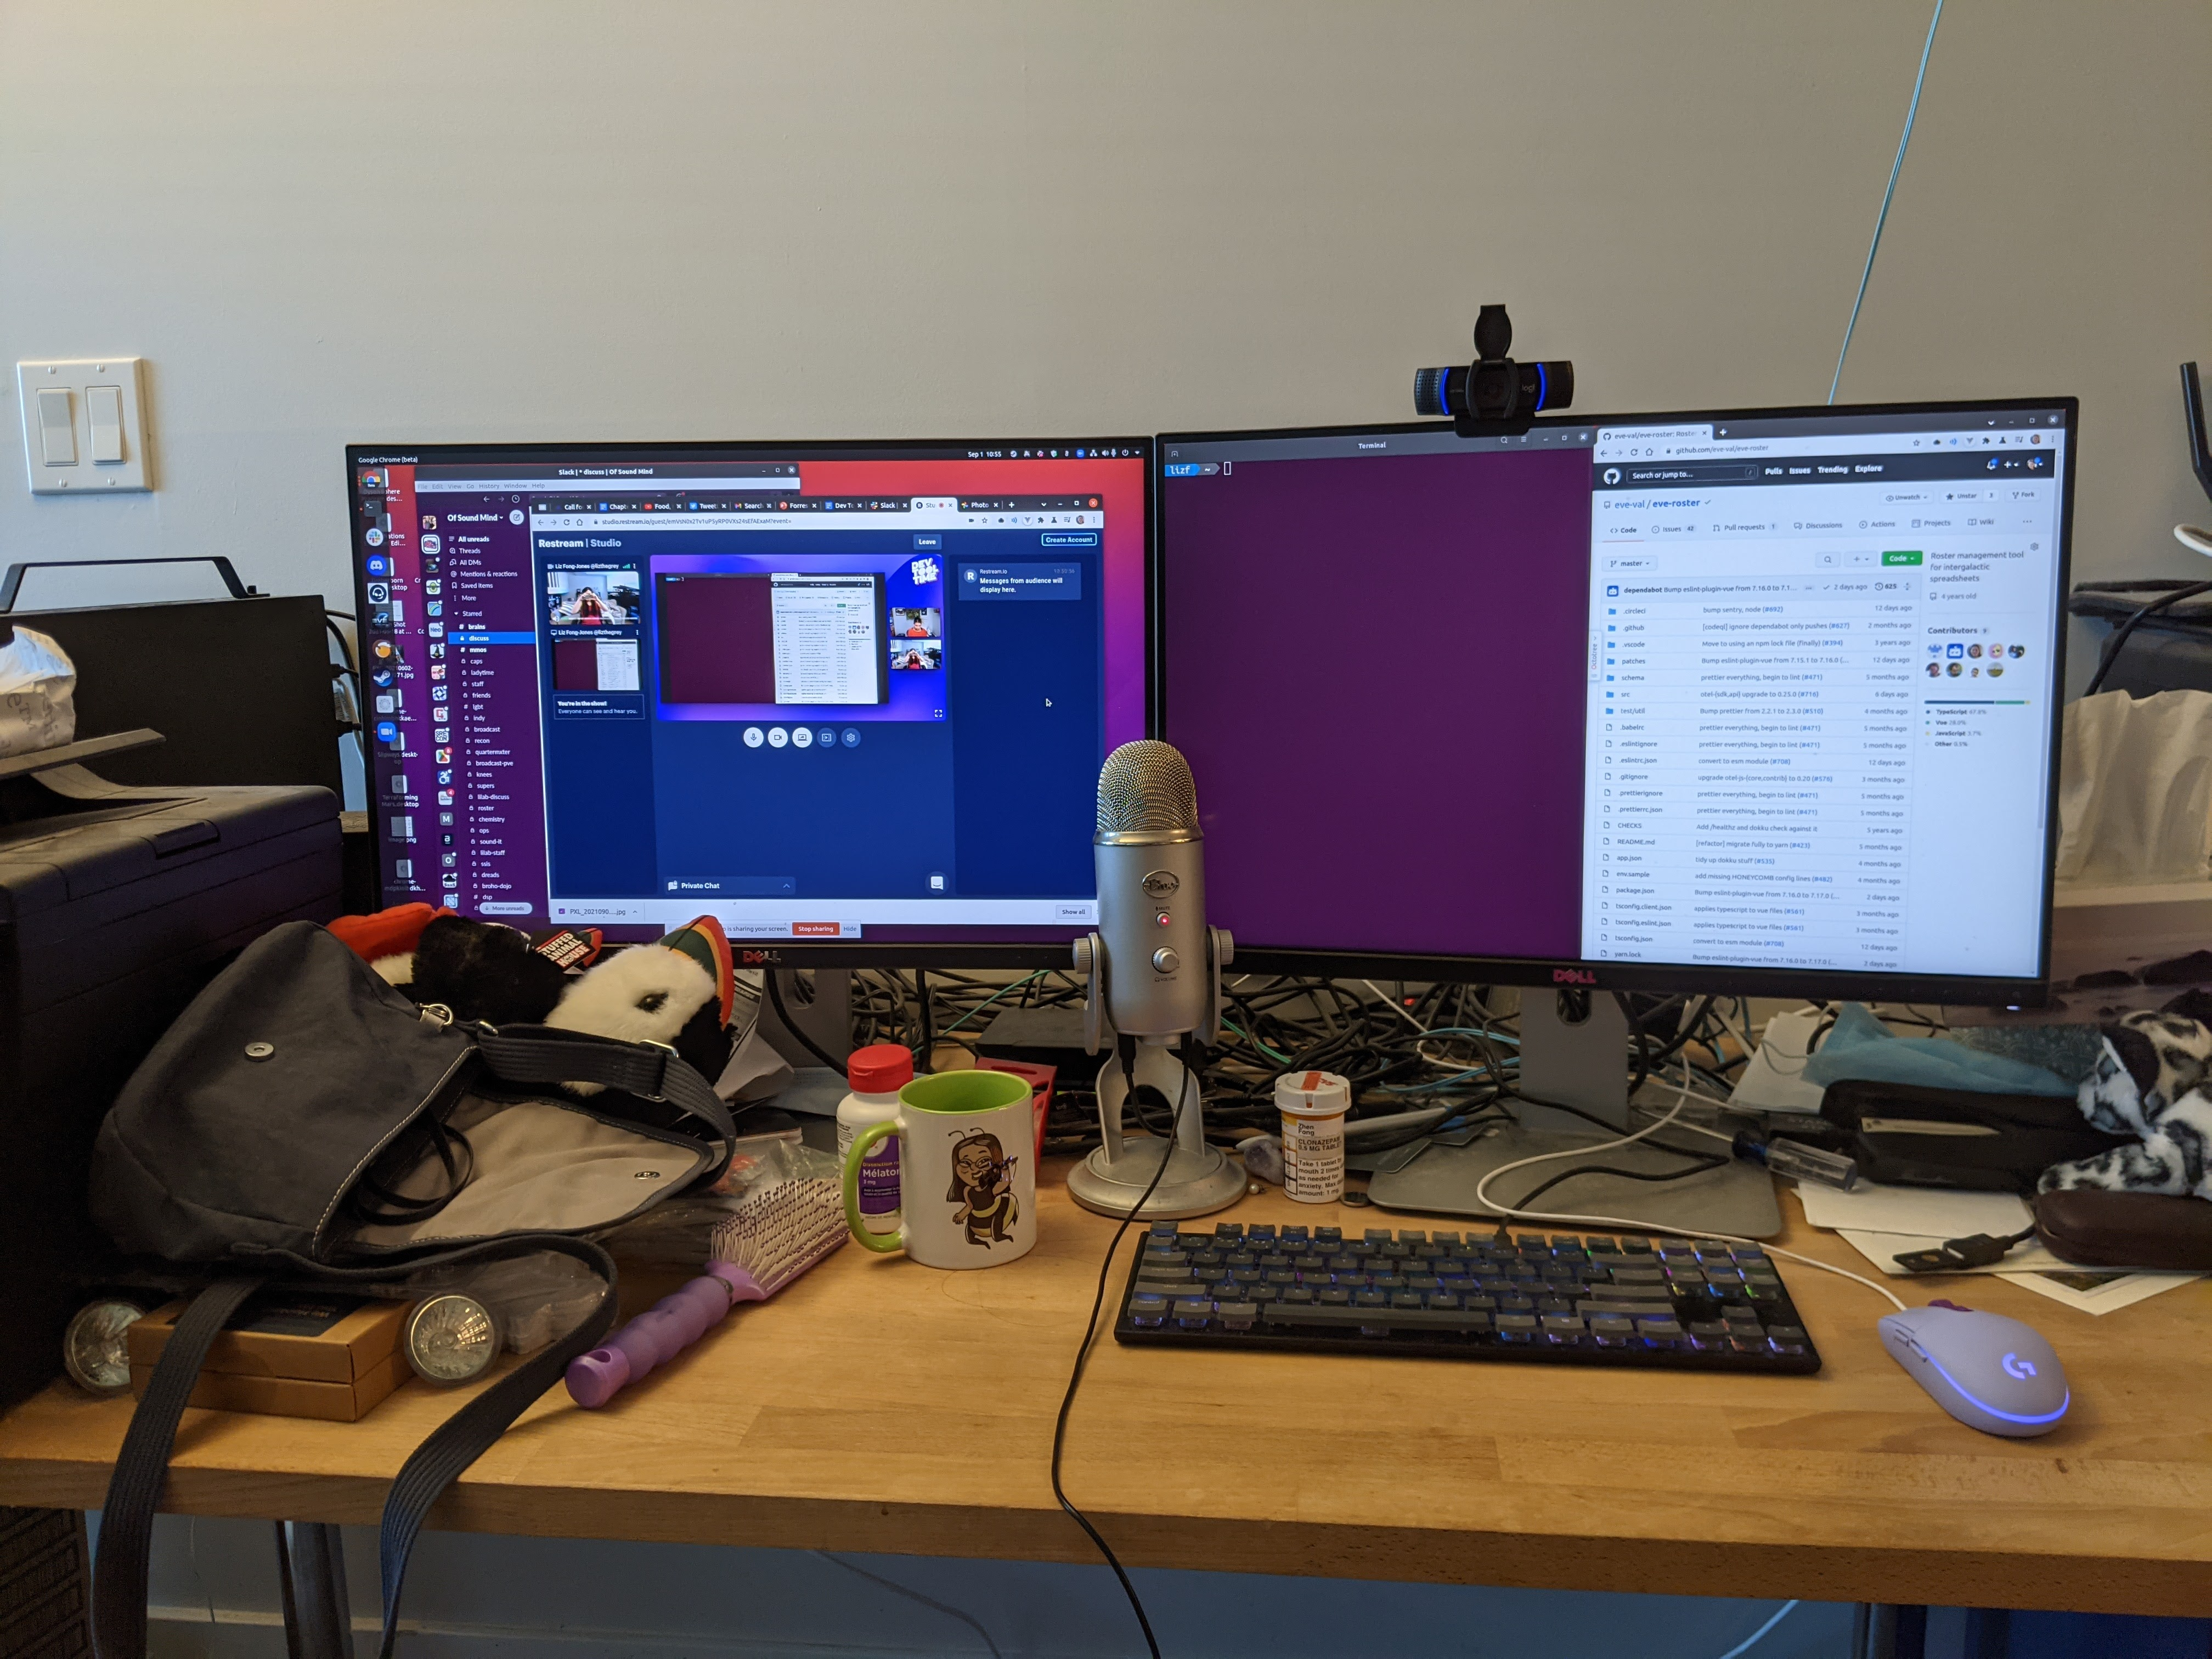 Liz's main work desk